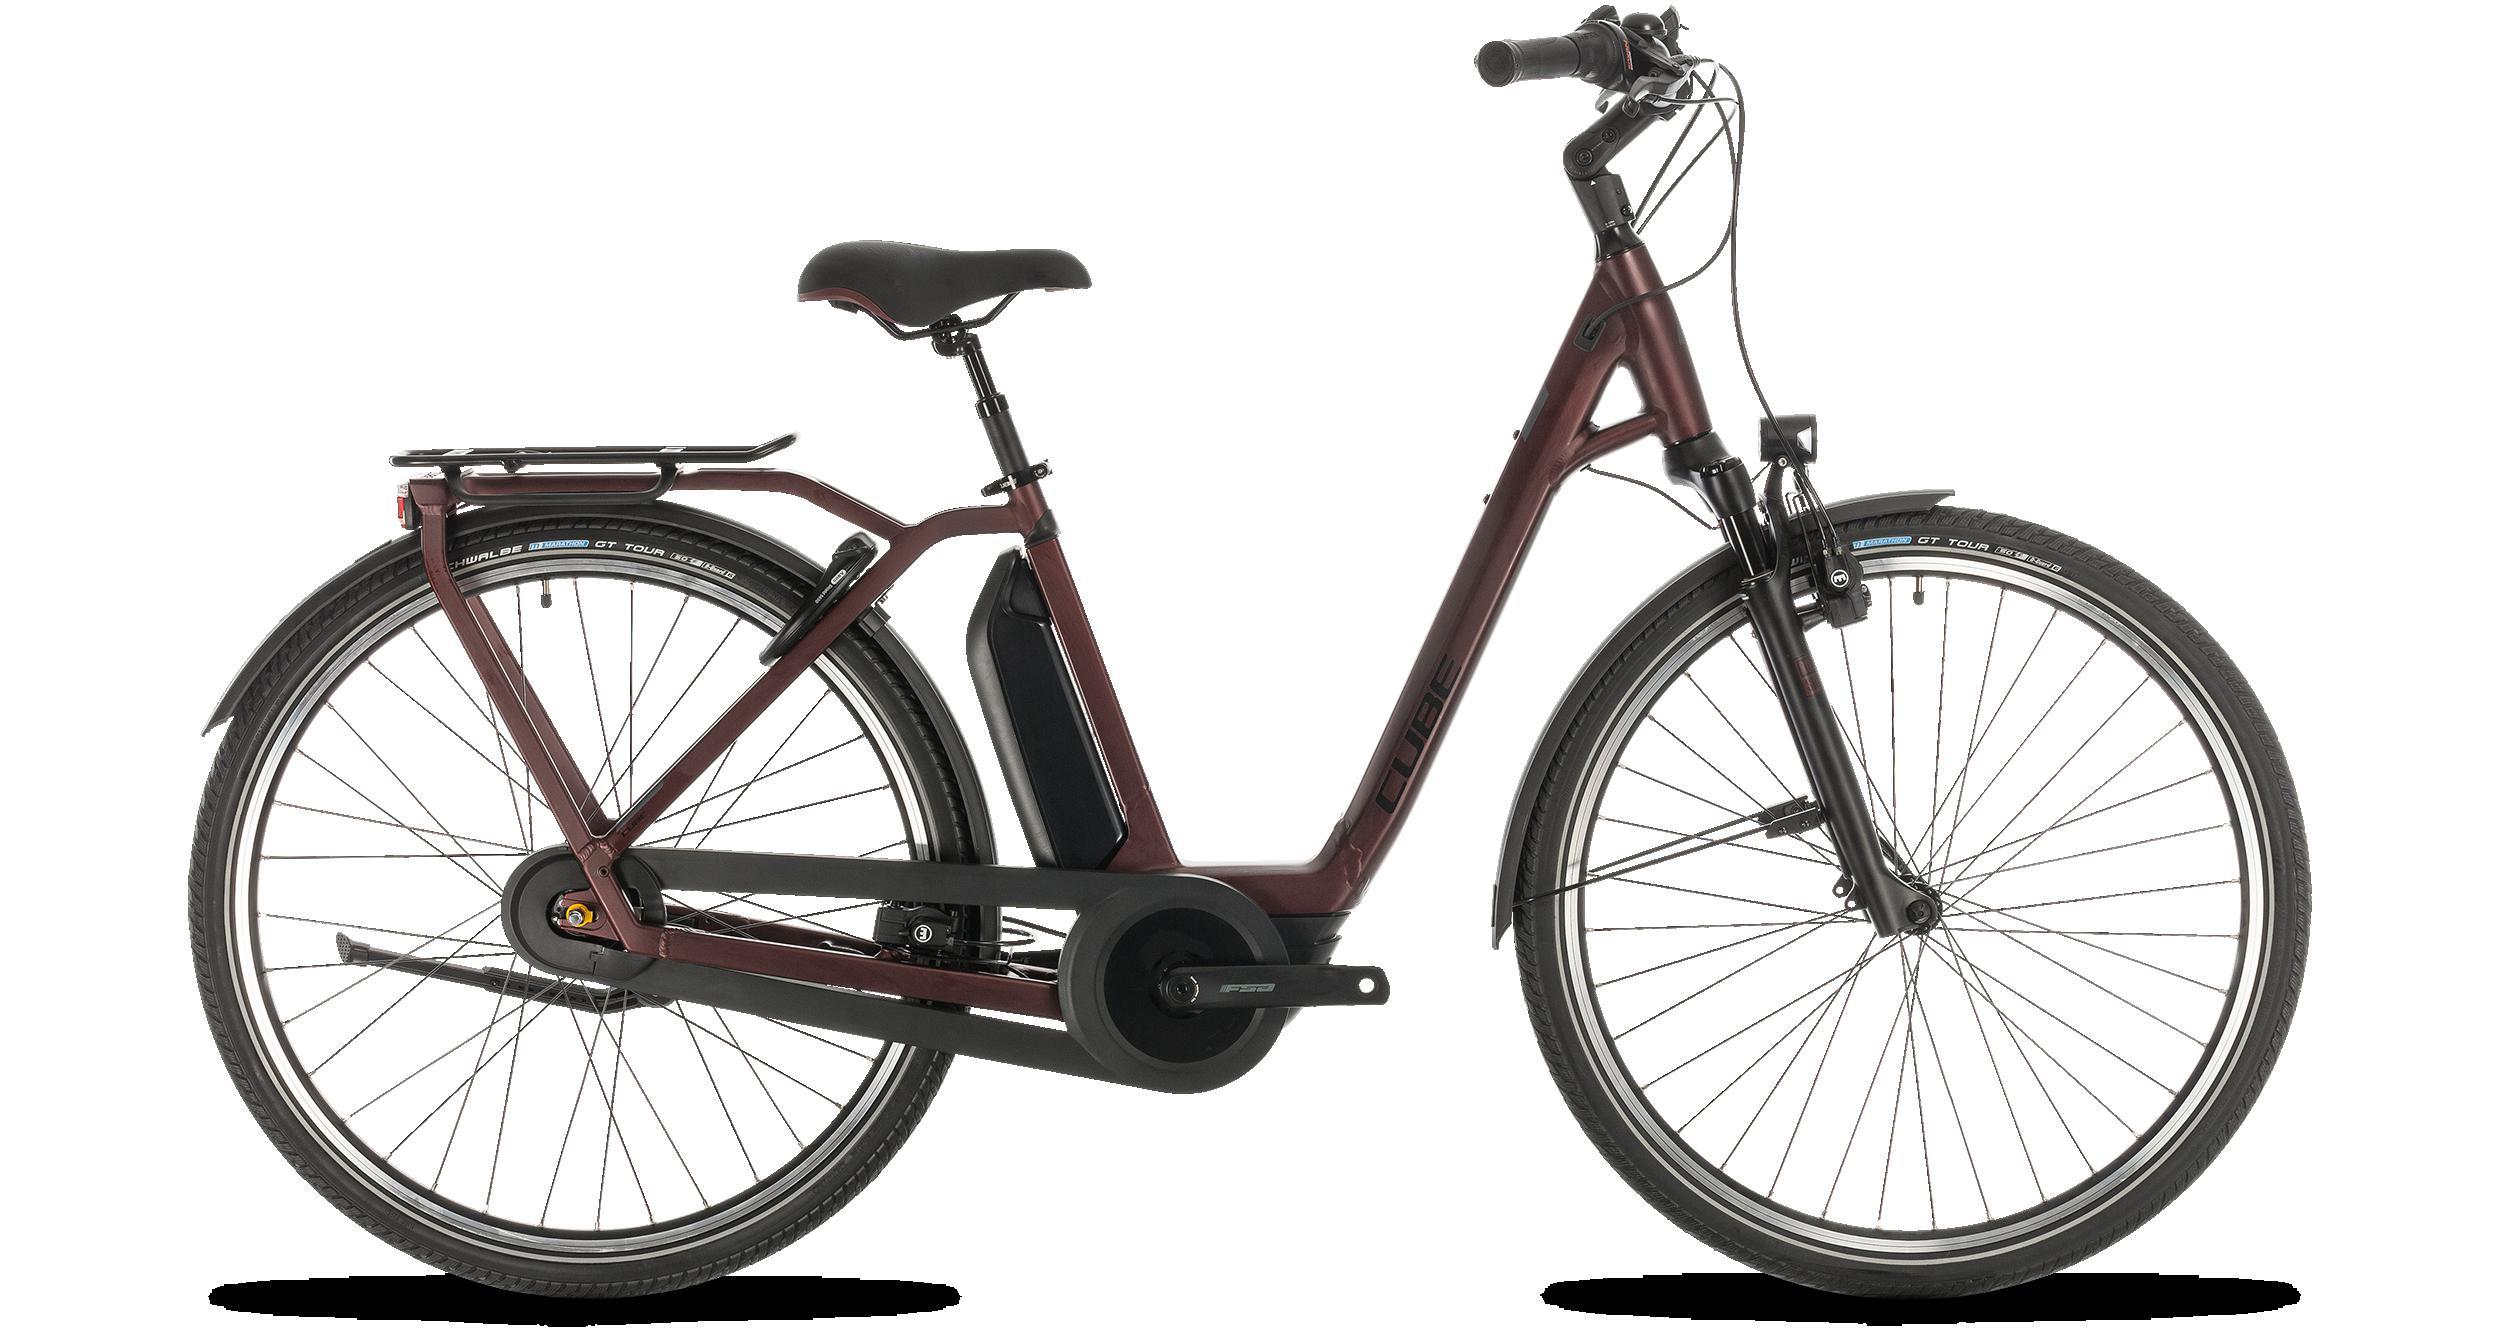 cube town hybrid exc 500 red n black trekking e bike 2020. Black Bedroom Furniture Sets. Home Design Ideas